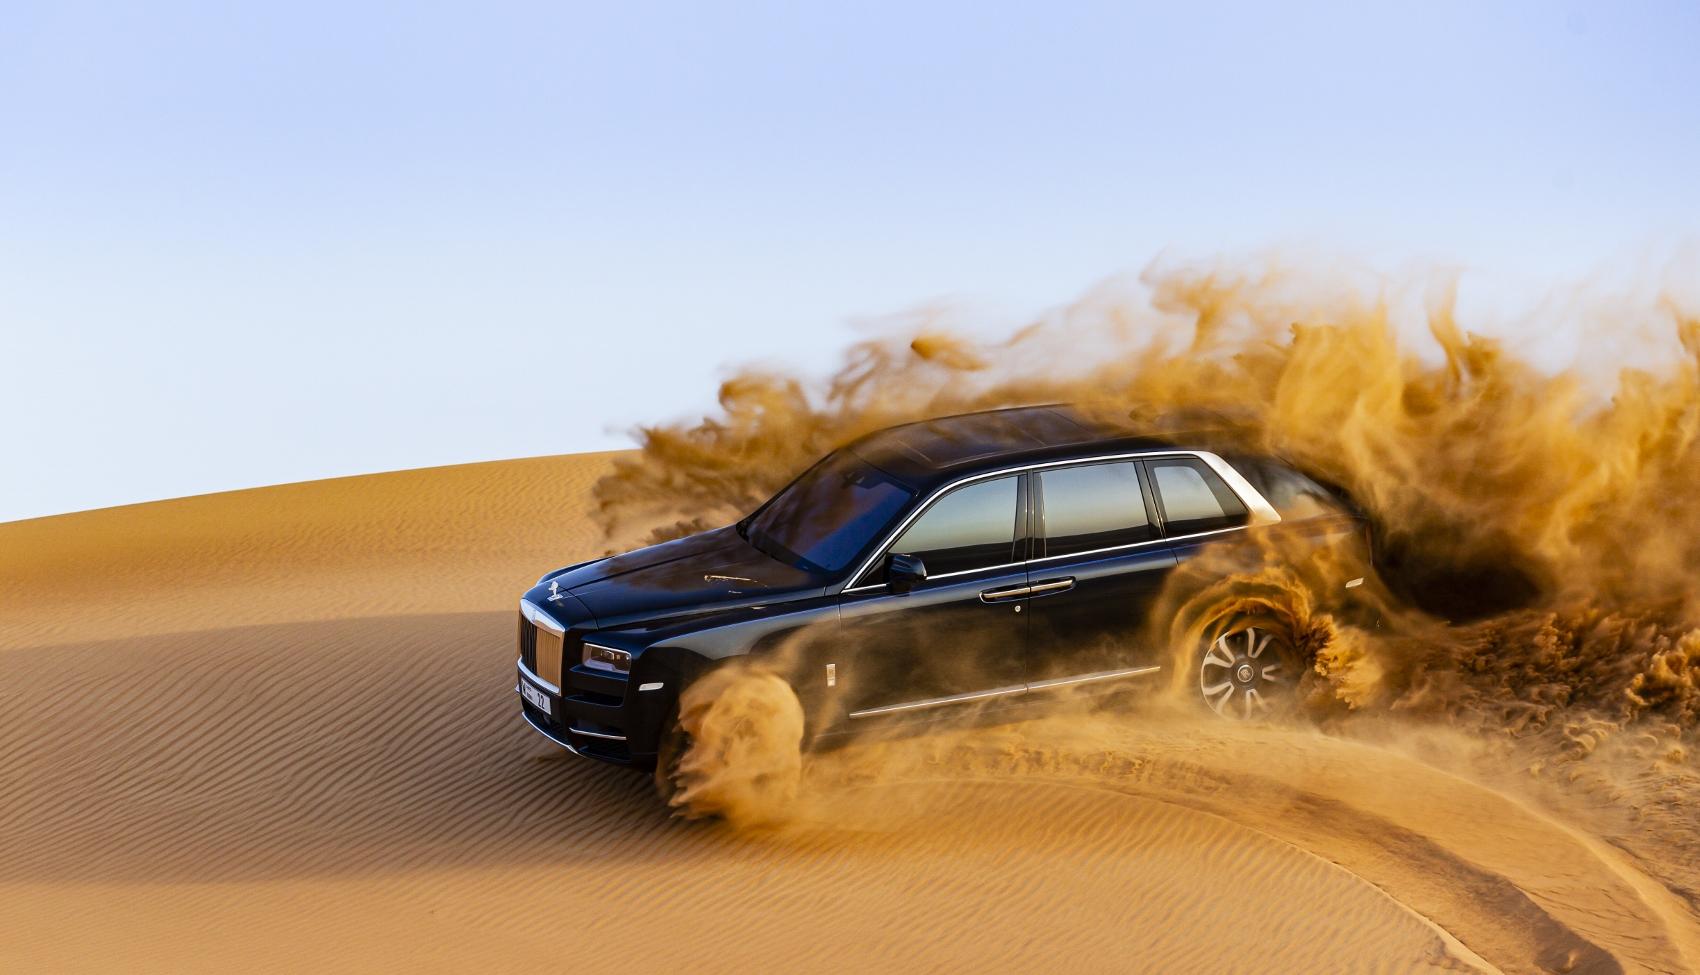 Rolls Royce Cullinan sa predviedol na púšti. Pozrite si foto aj video o6isqF2rso rolls-royce-cullina